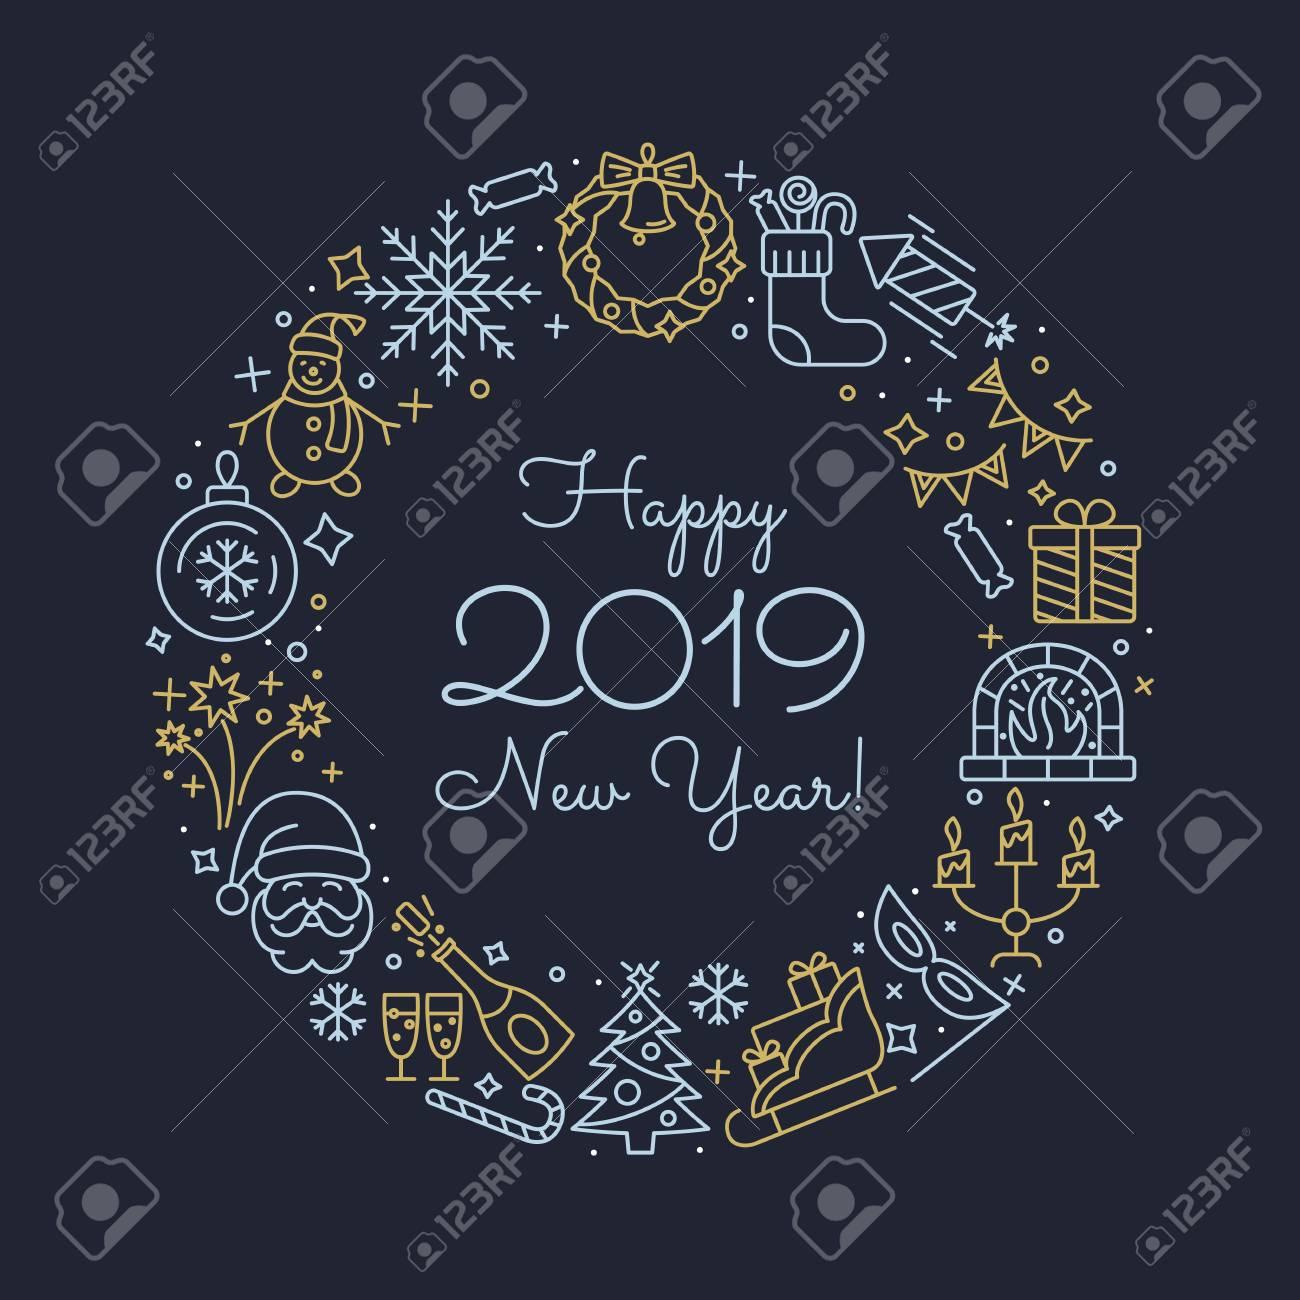 Happy New Year Elegant Images 27